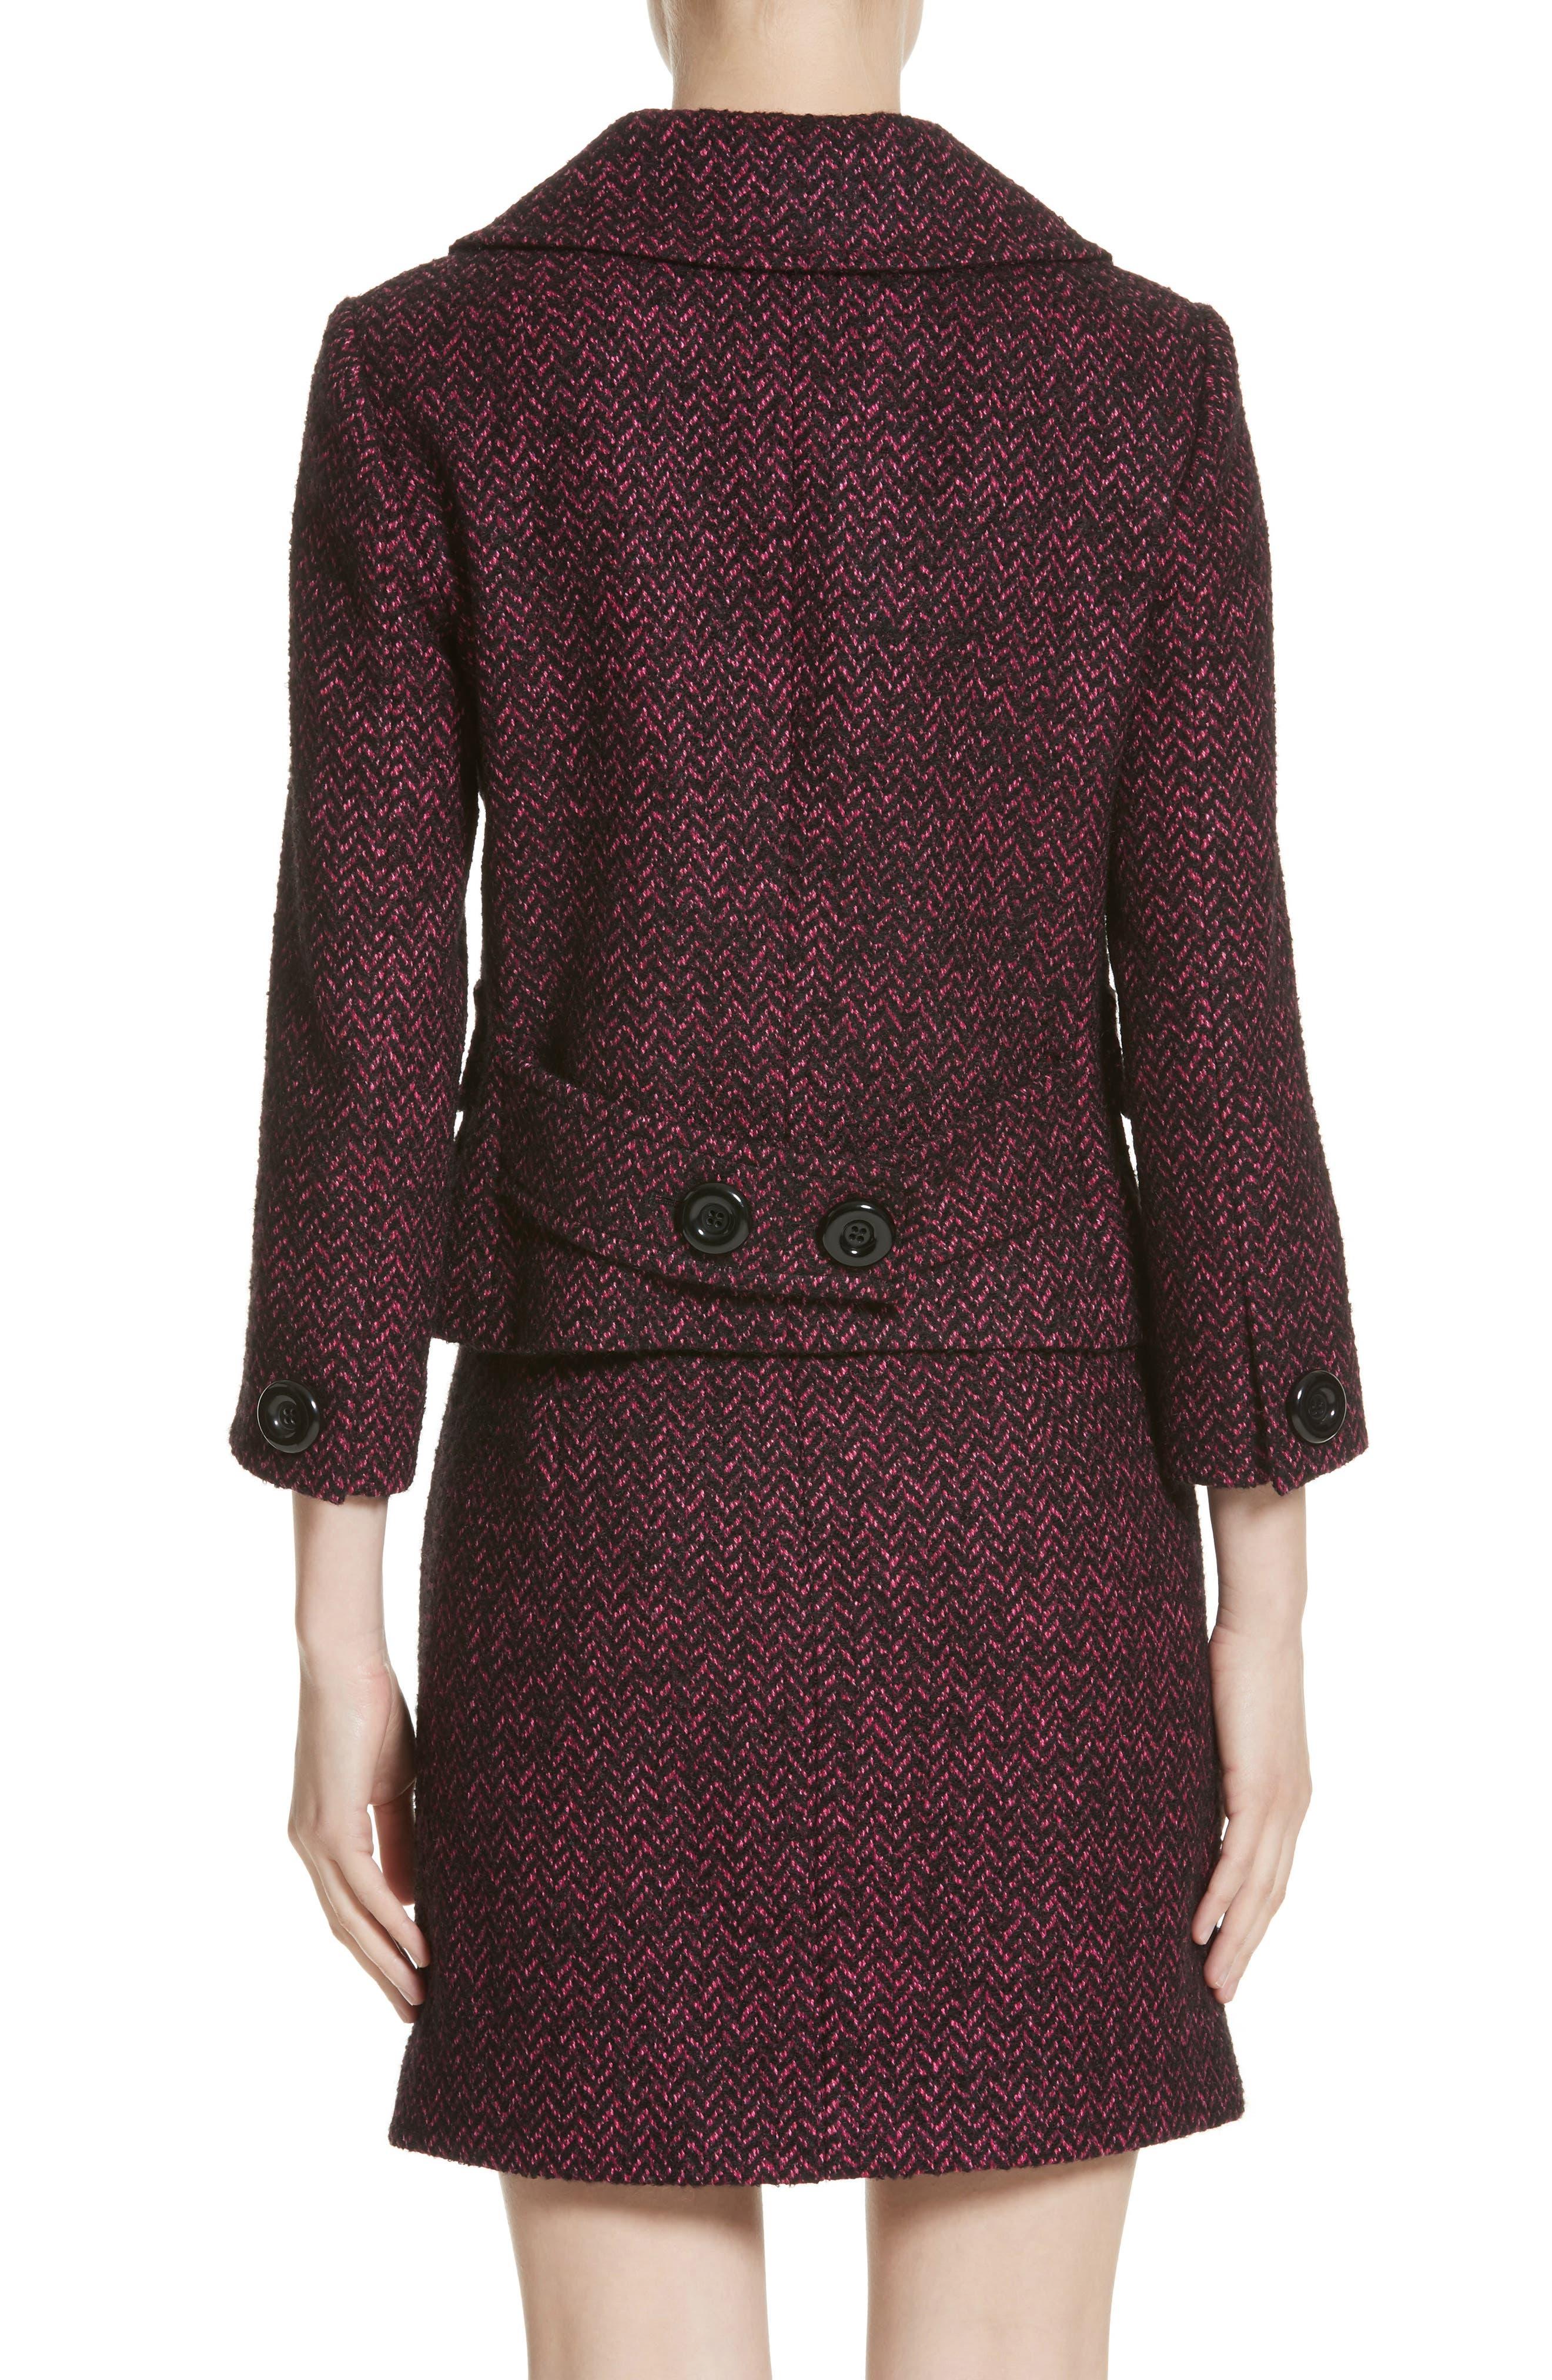 Herringbone Wool Blend Jacket,                             Alternate thumbnail 2, color,                             Magnolia/ Black